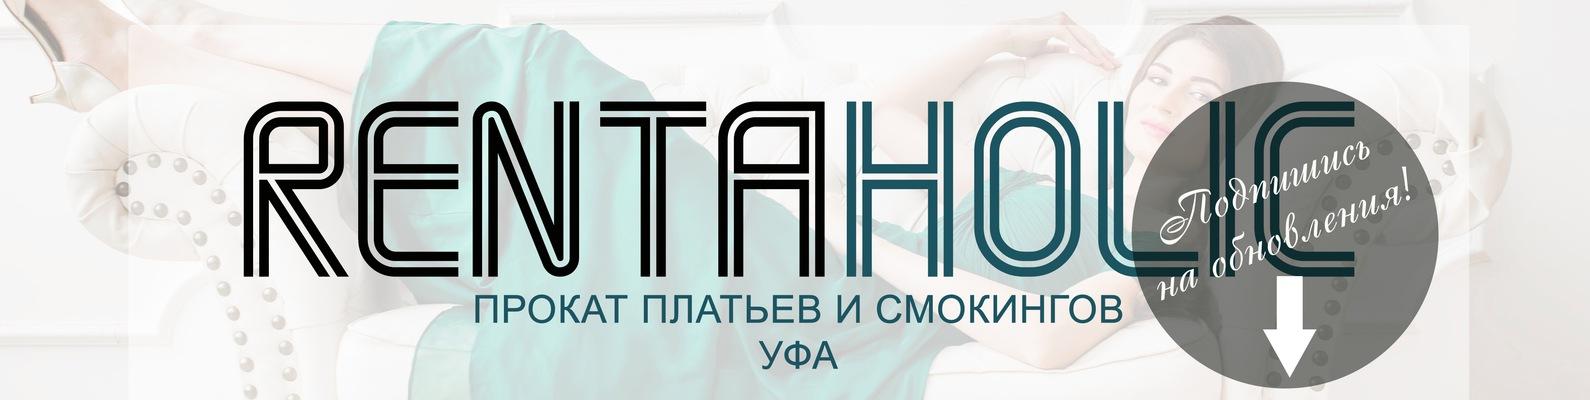 cacd186924fe6b1 Прокат платьев и смокингов Уфа ☆RENTAHOLIC☆   ВКонтакте